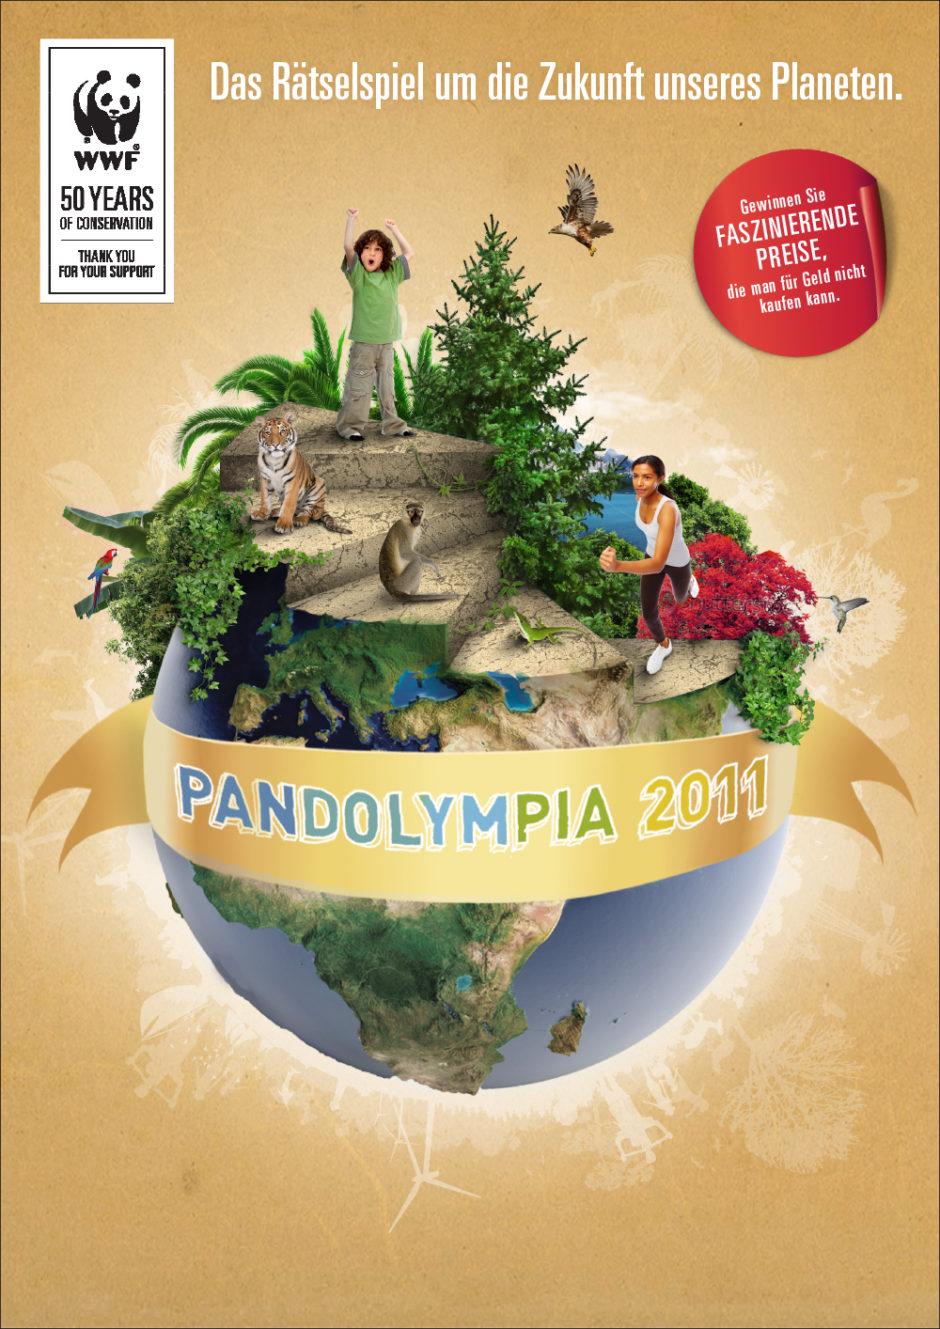 wwf_pandolympia_cover